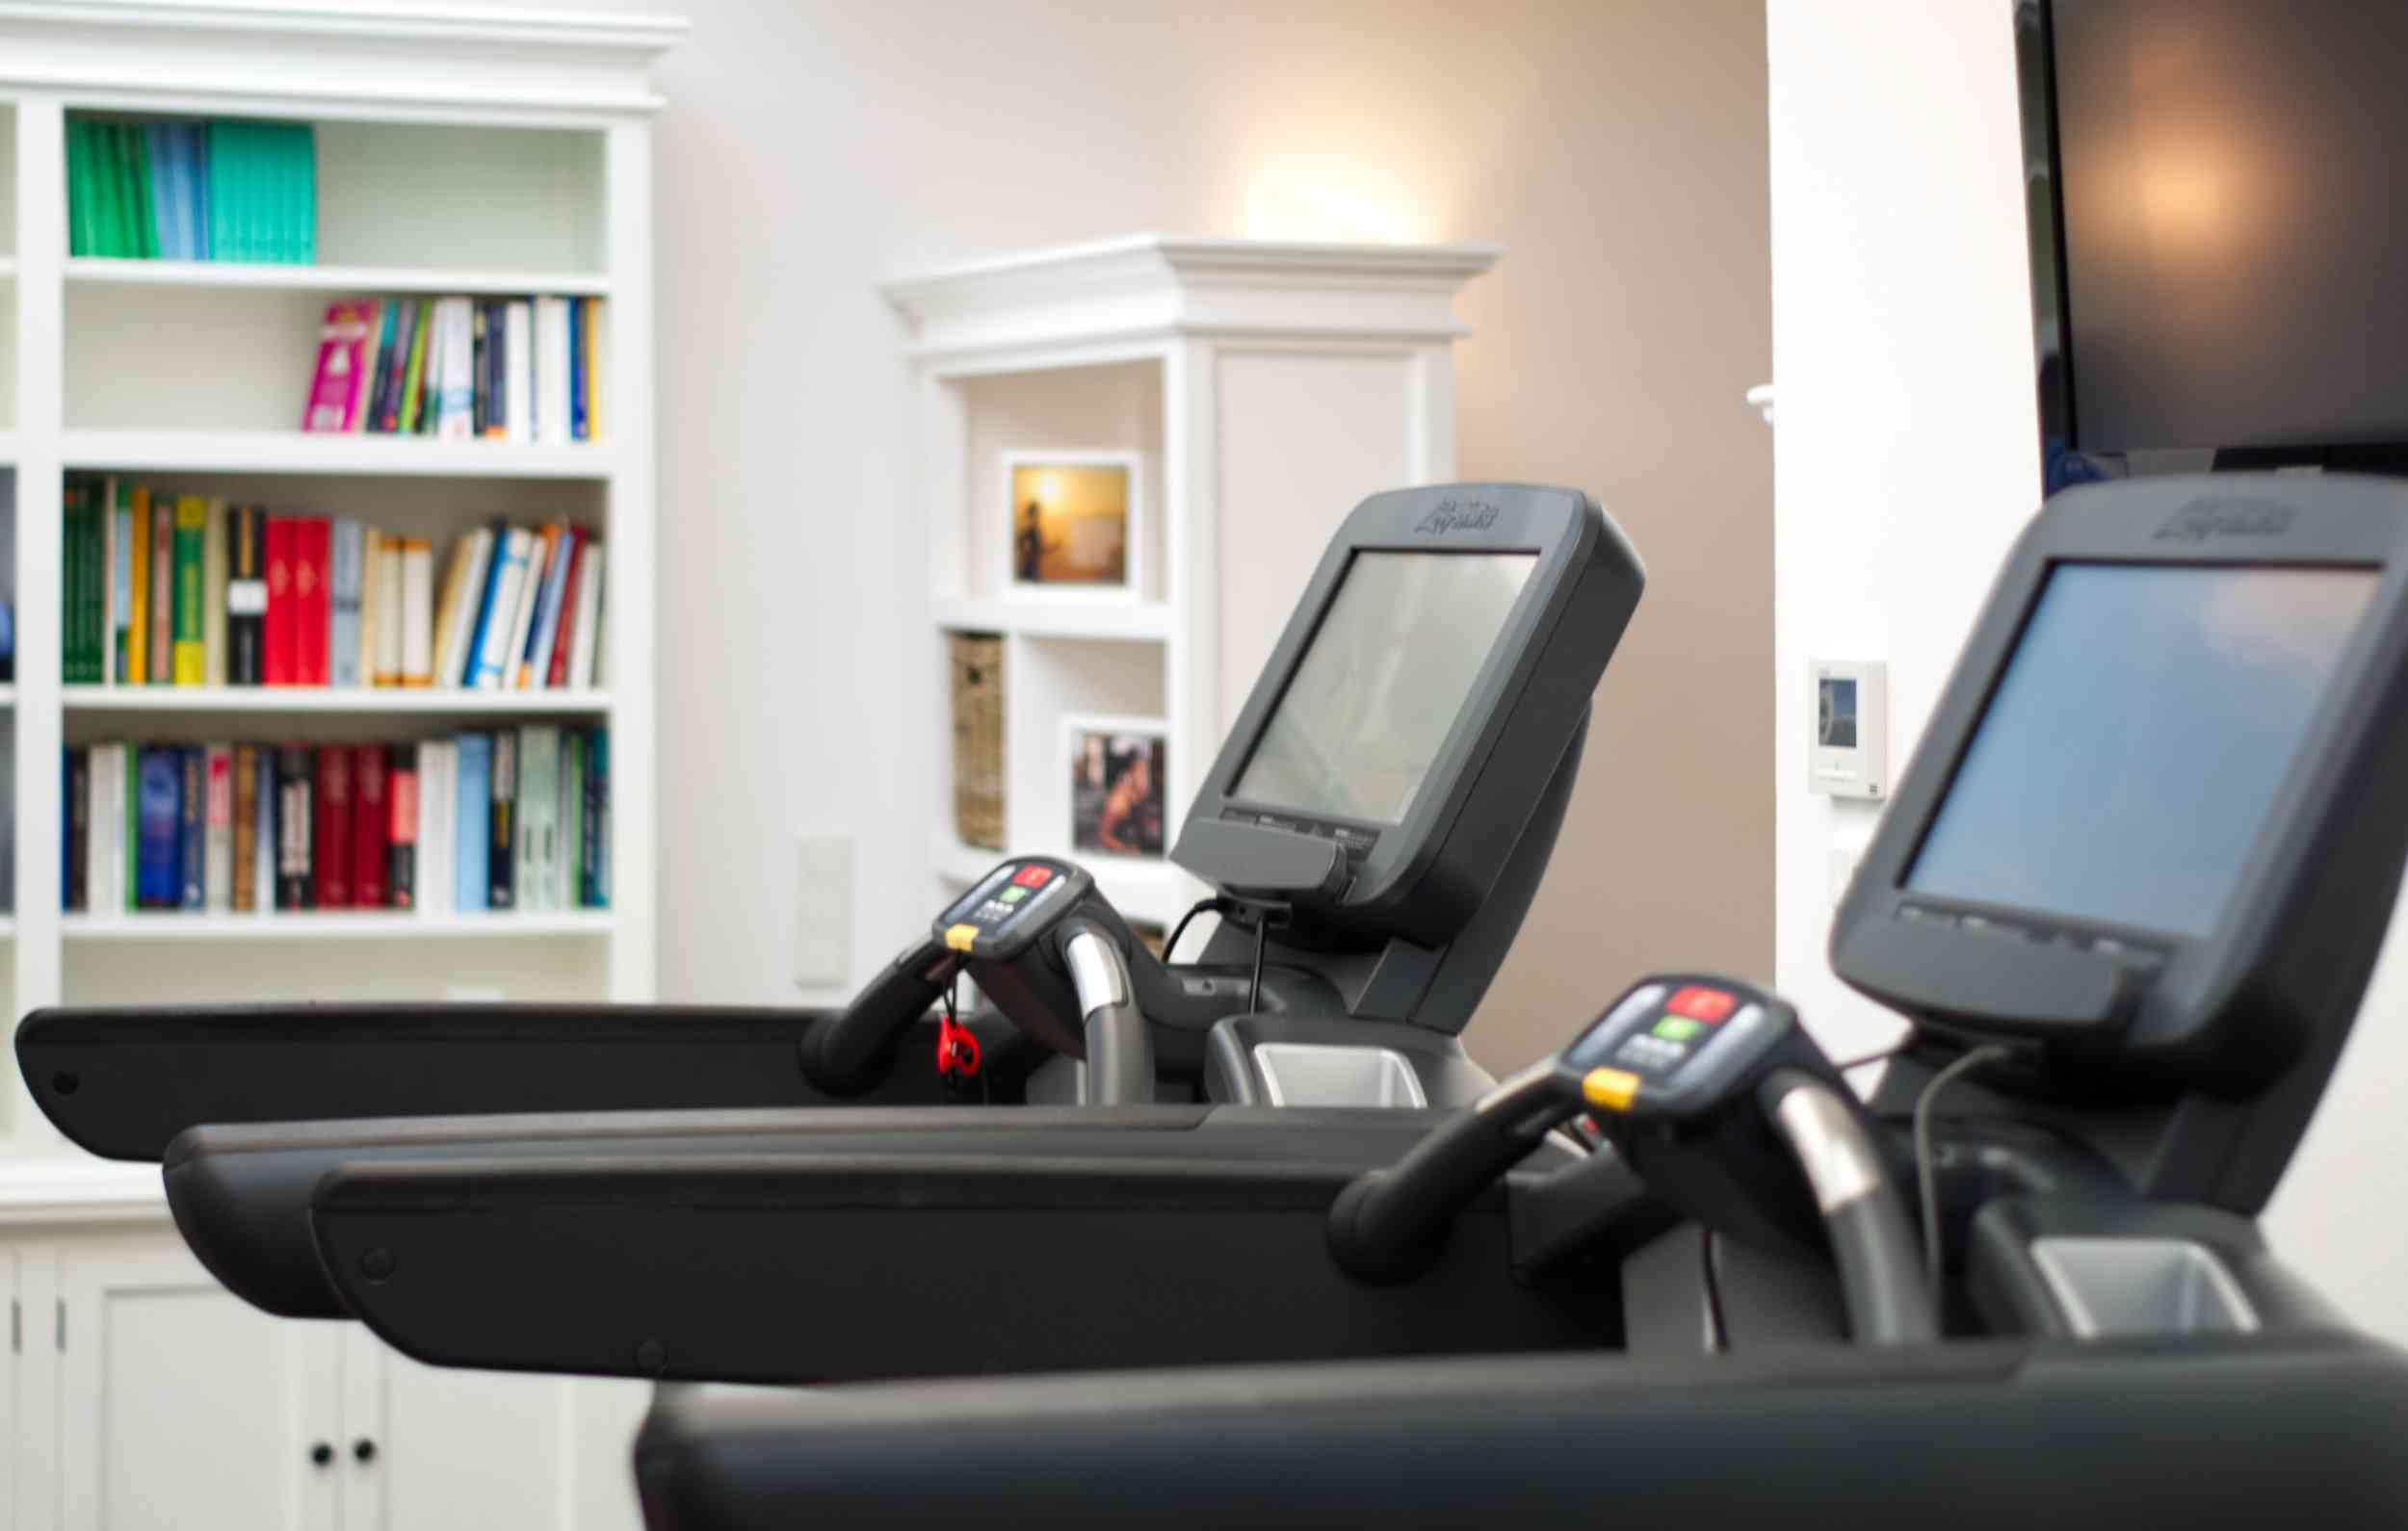 Treadmills in the fitness room